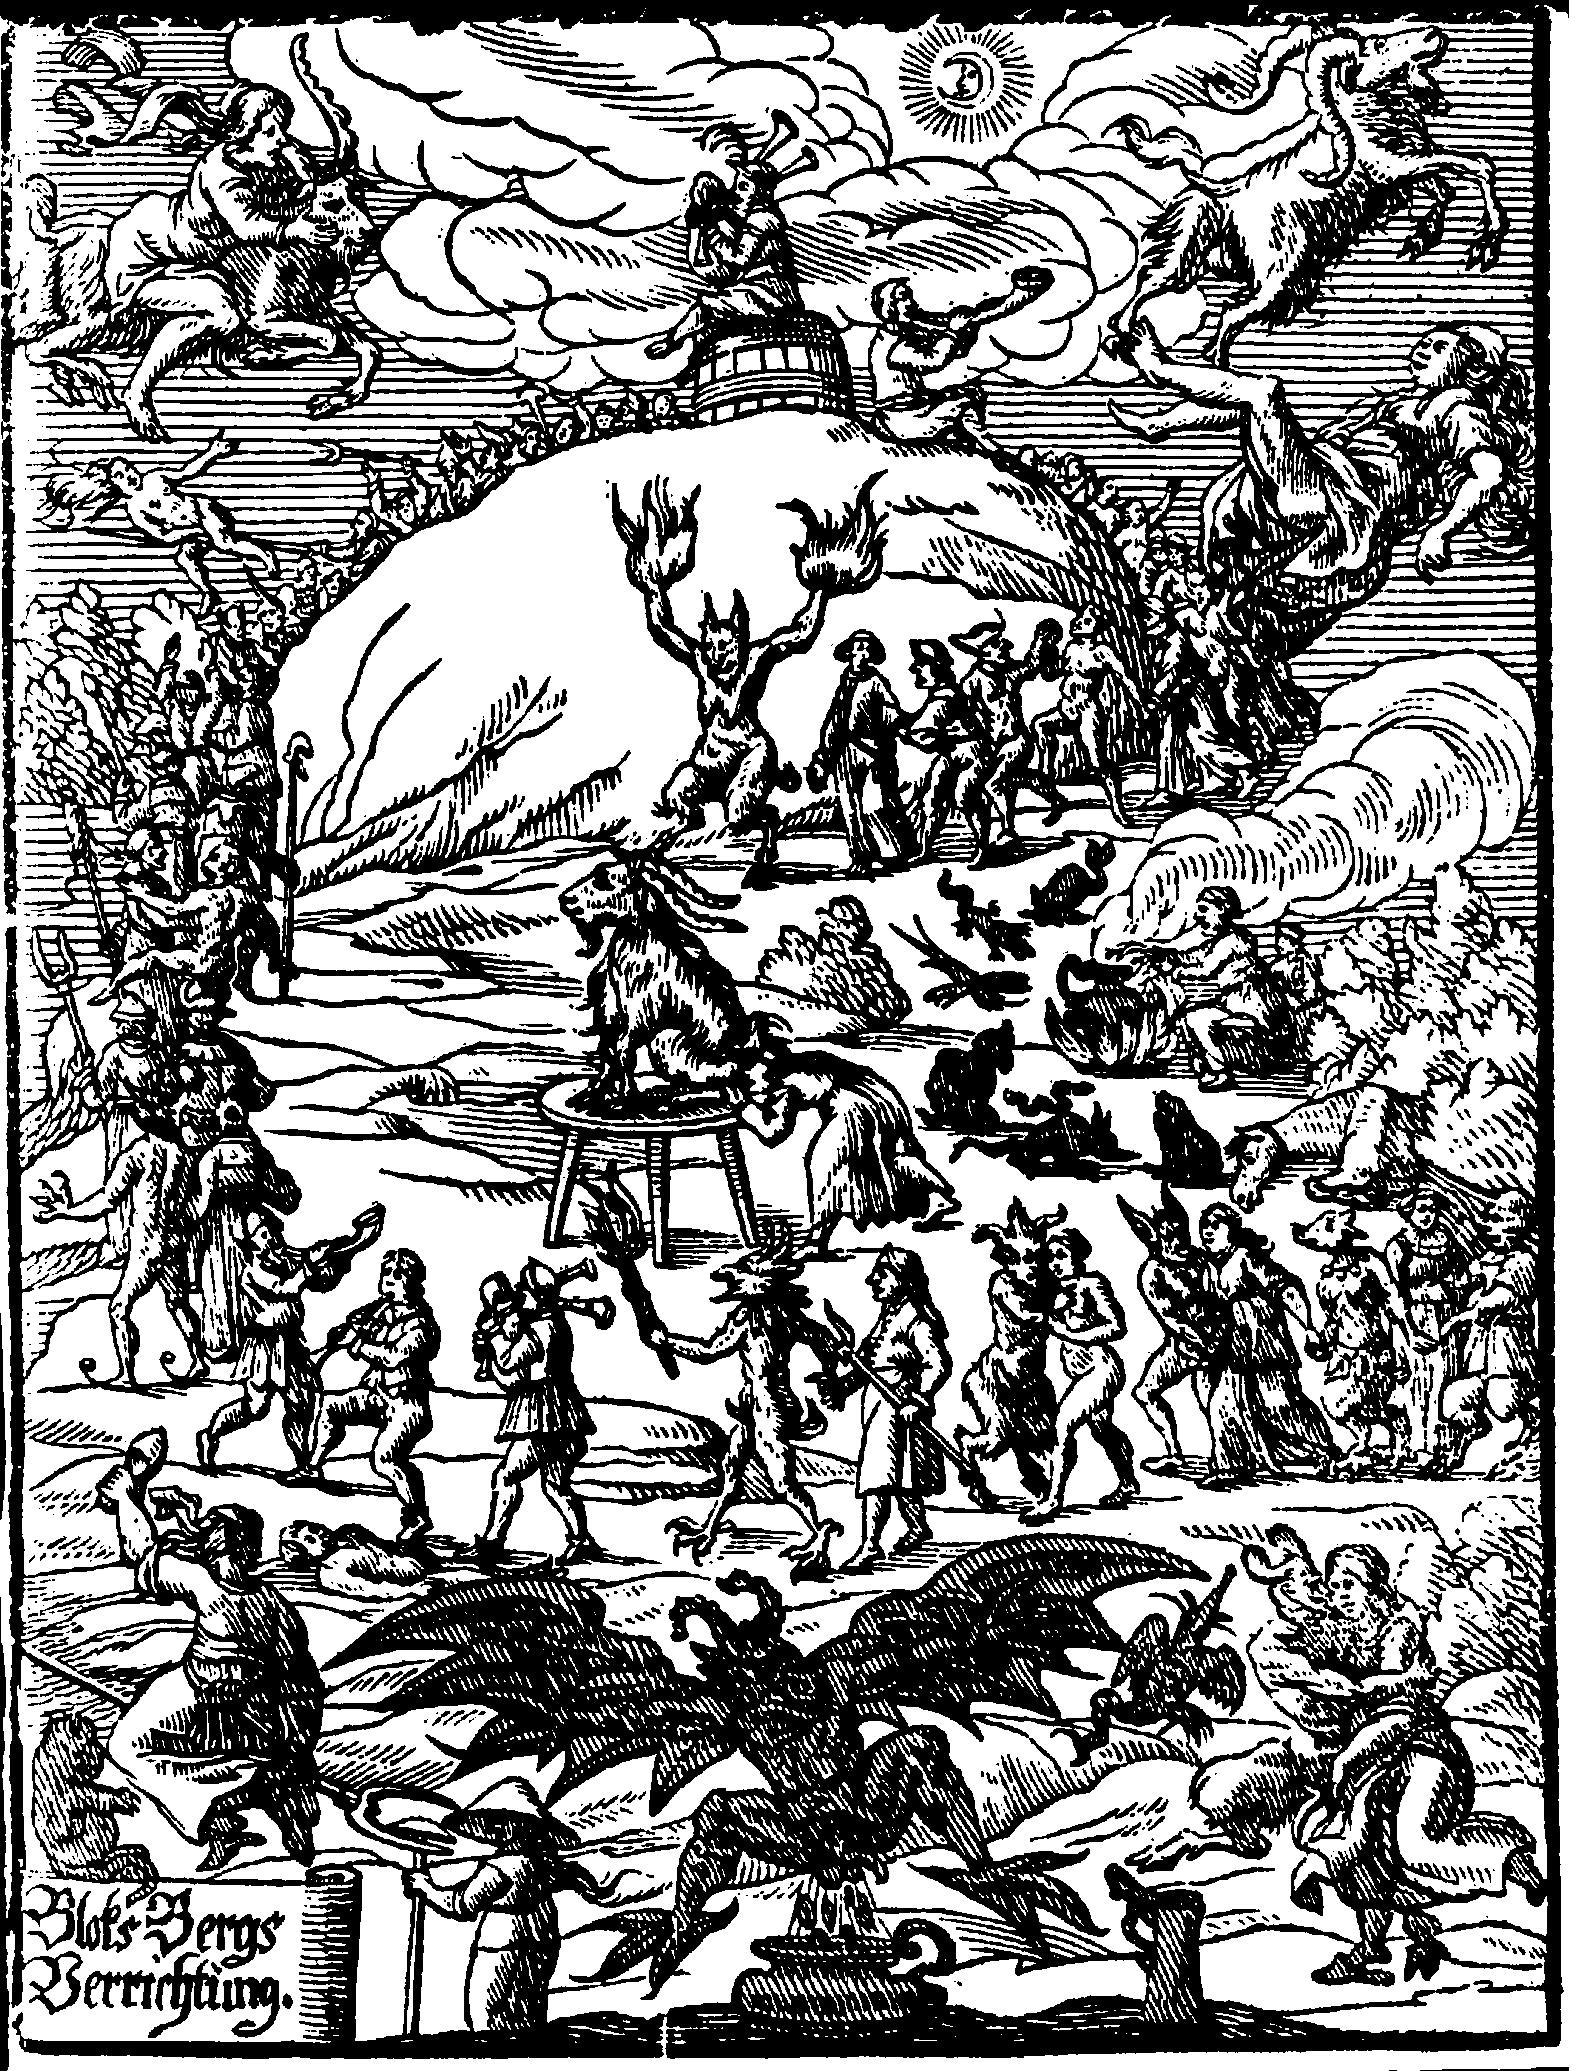 Johannes Praetorius: Blockes-Berges Verrichtung, Leipzig 1668, Lizenz:Public Domain